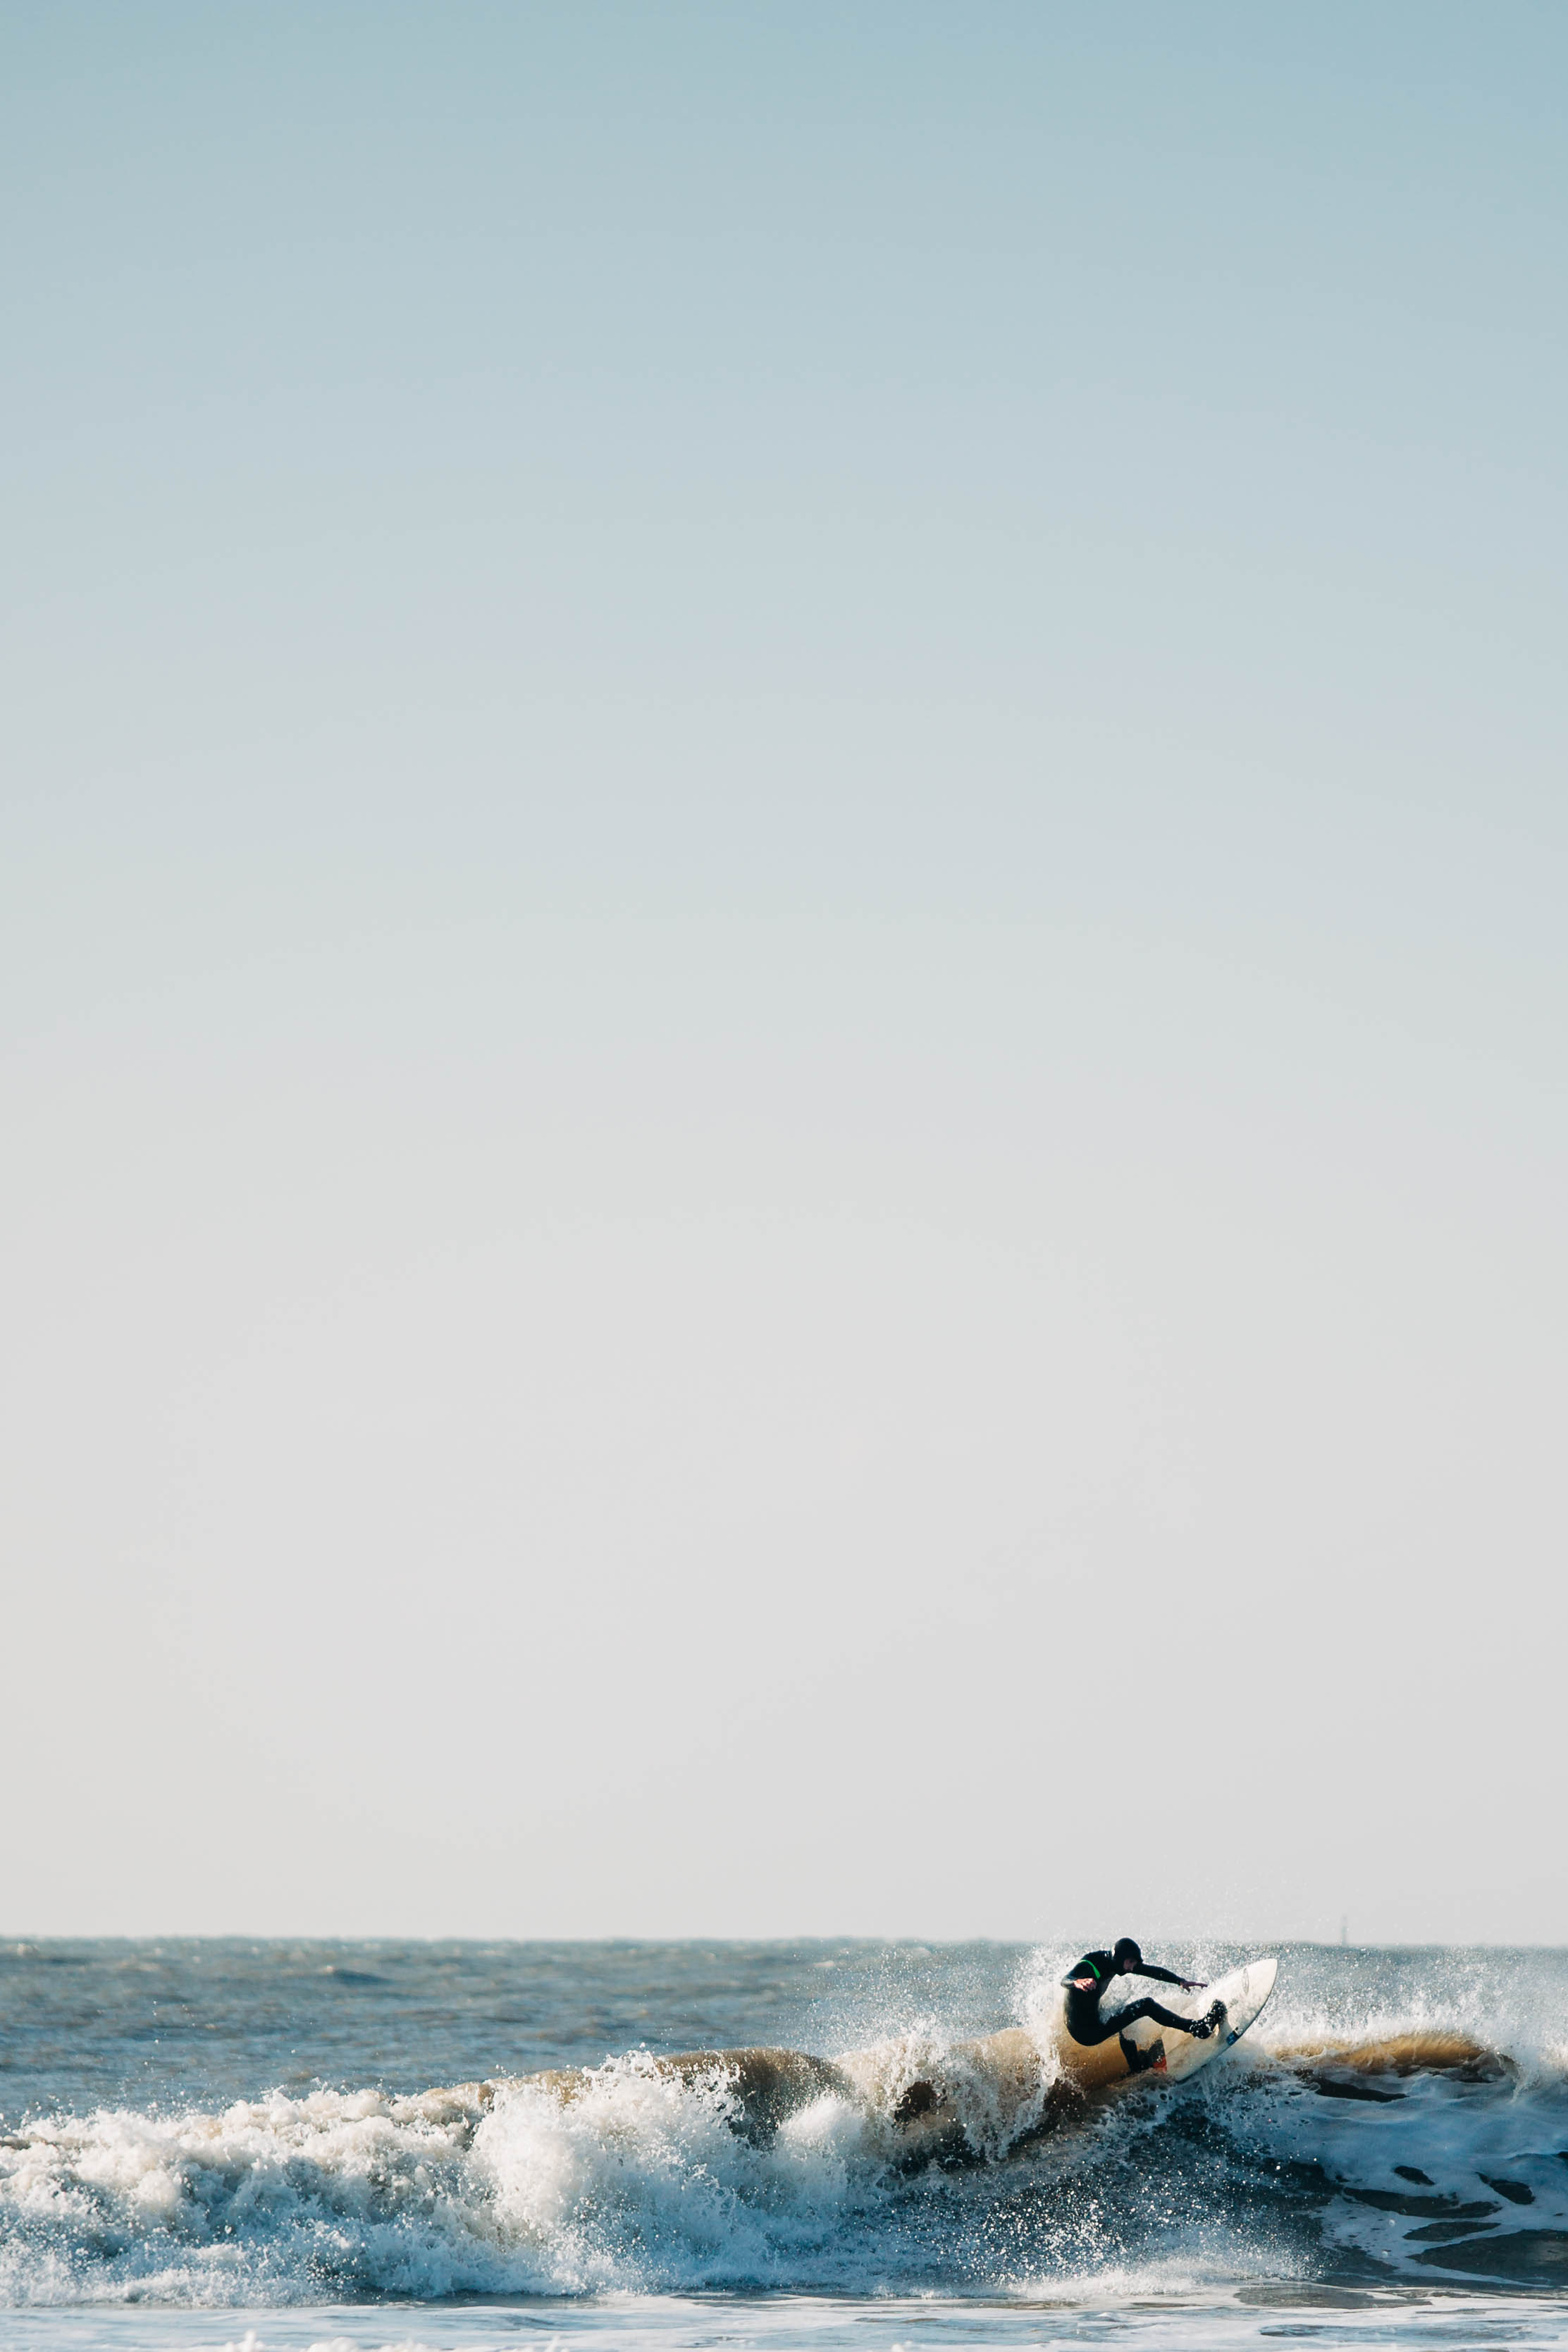 Alex_Sedgmond_Photography-Cardiff-SouthWales-PorthcawlRestbay-Surfing-EzraHames-58.jpg